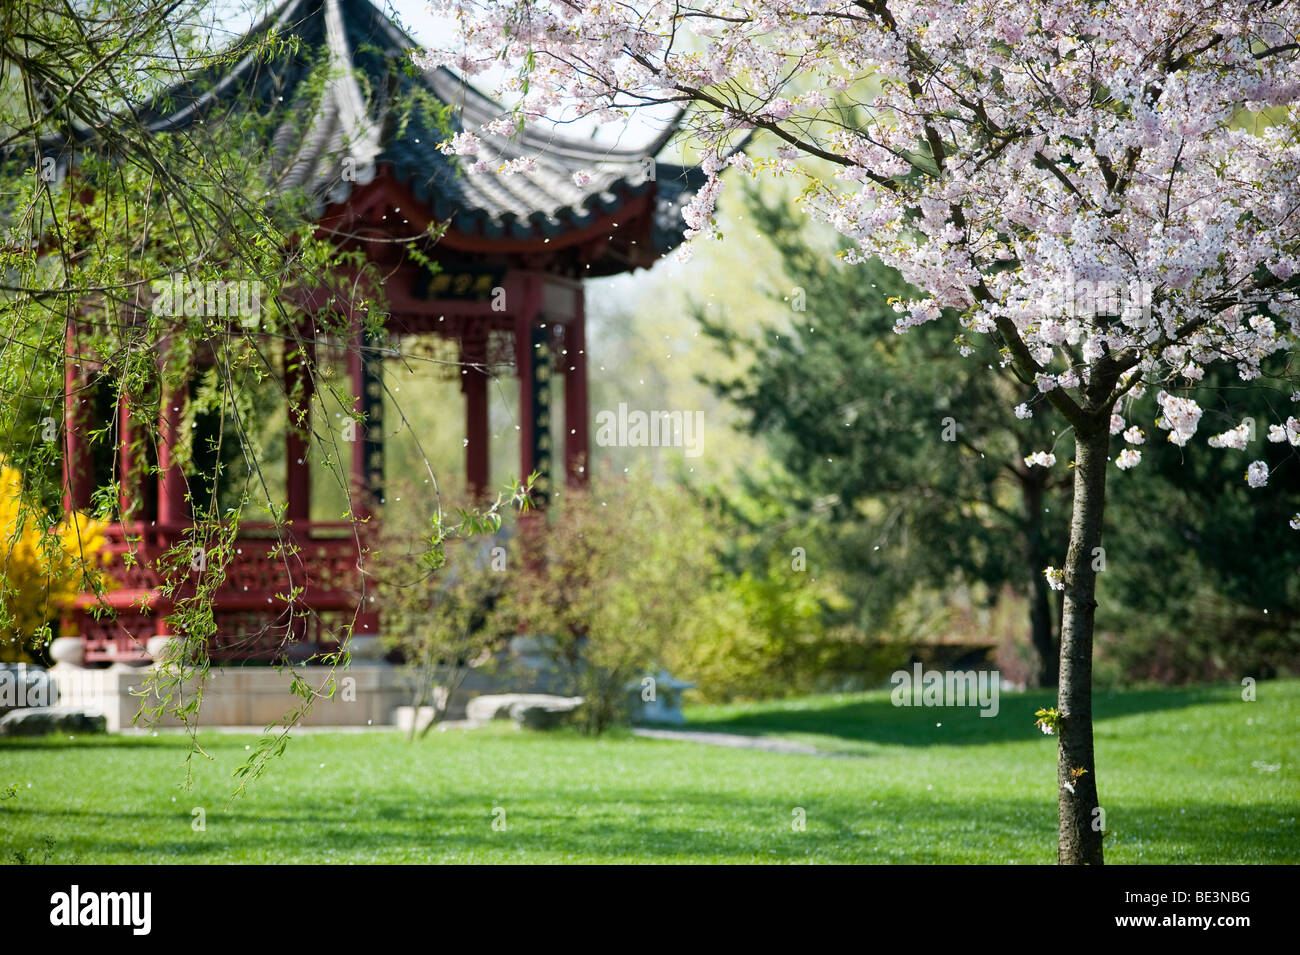 China garten berlin munich germany pictures and travel for Gartenausstellung munchen